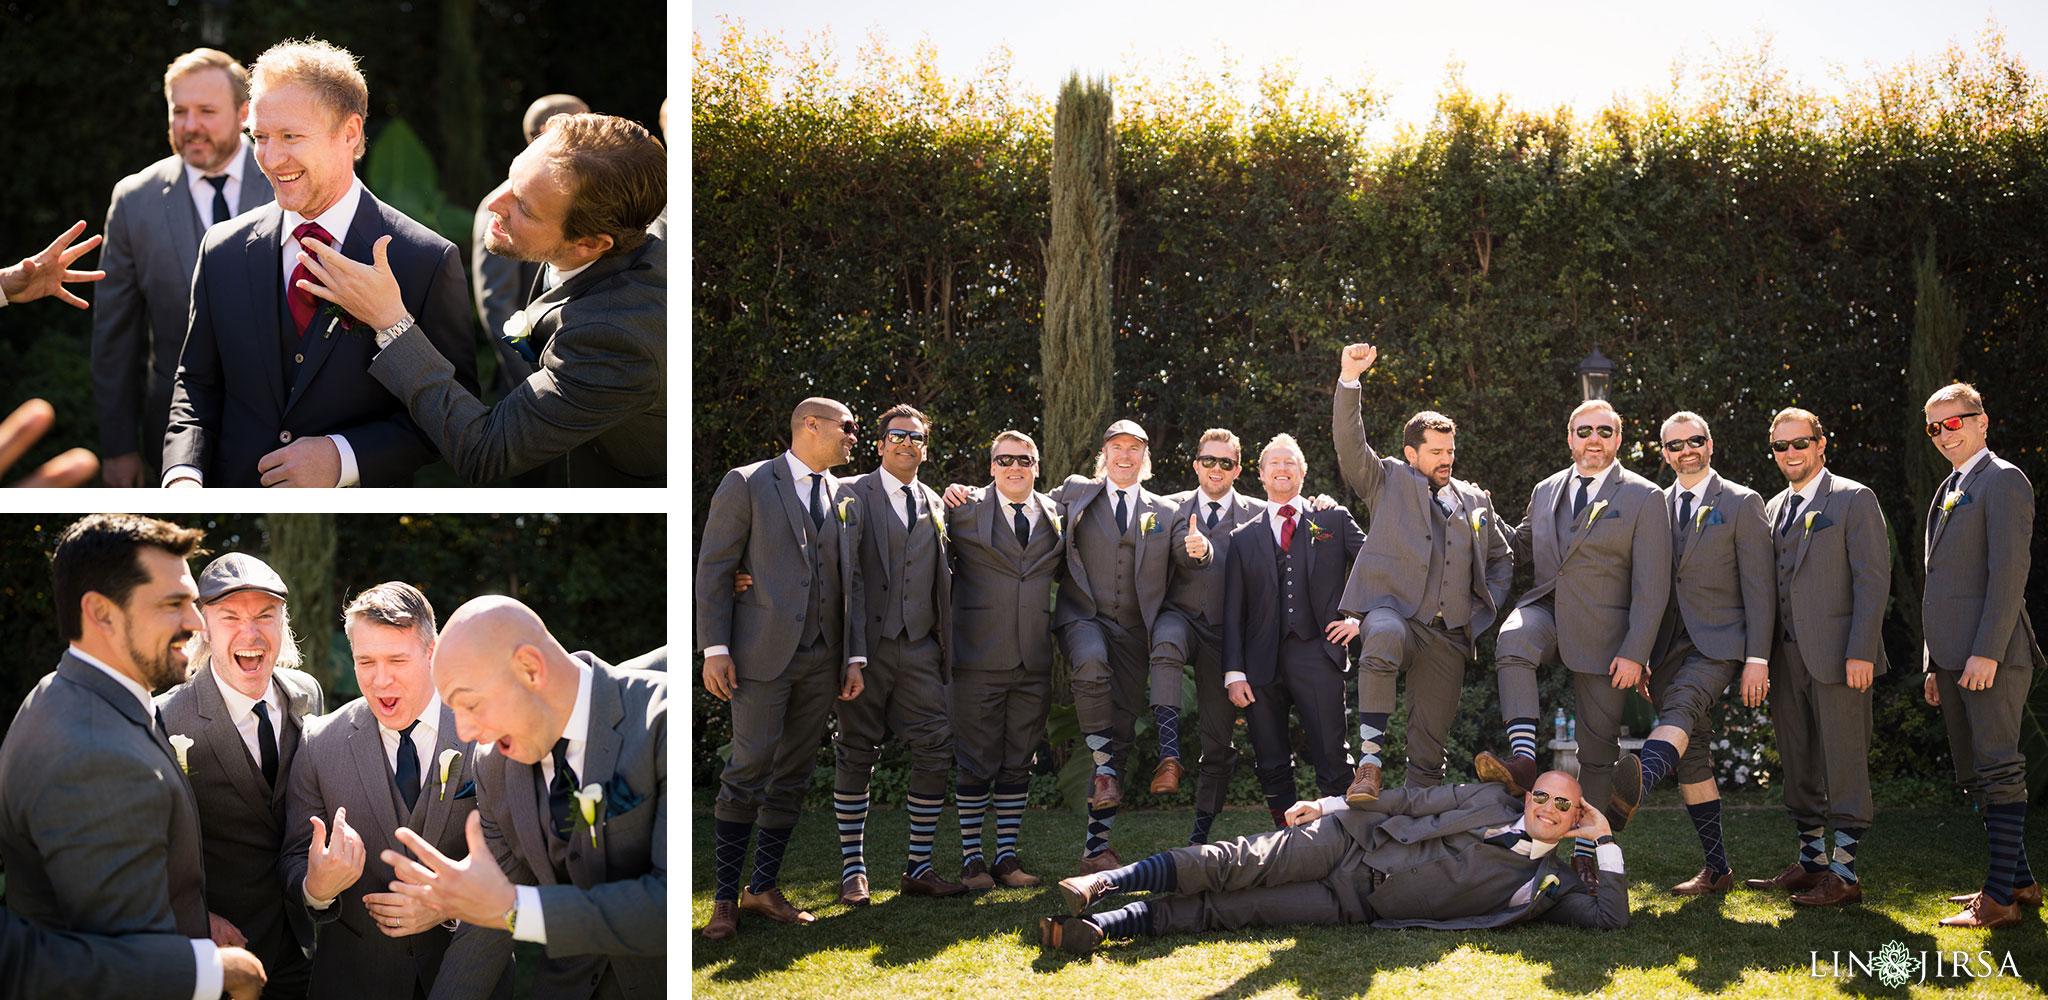 12 altadena town country club pakistani groom wedding photography